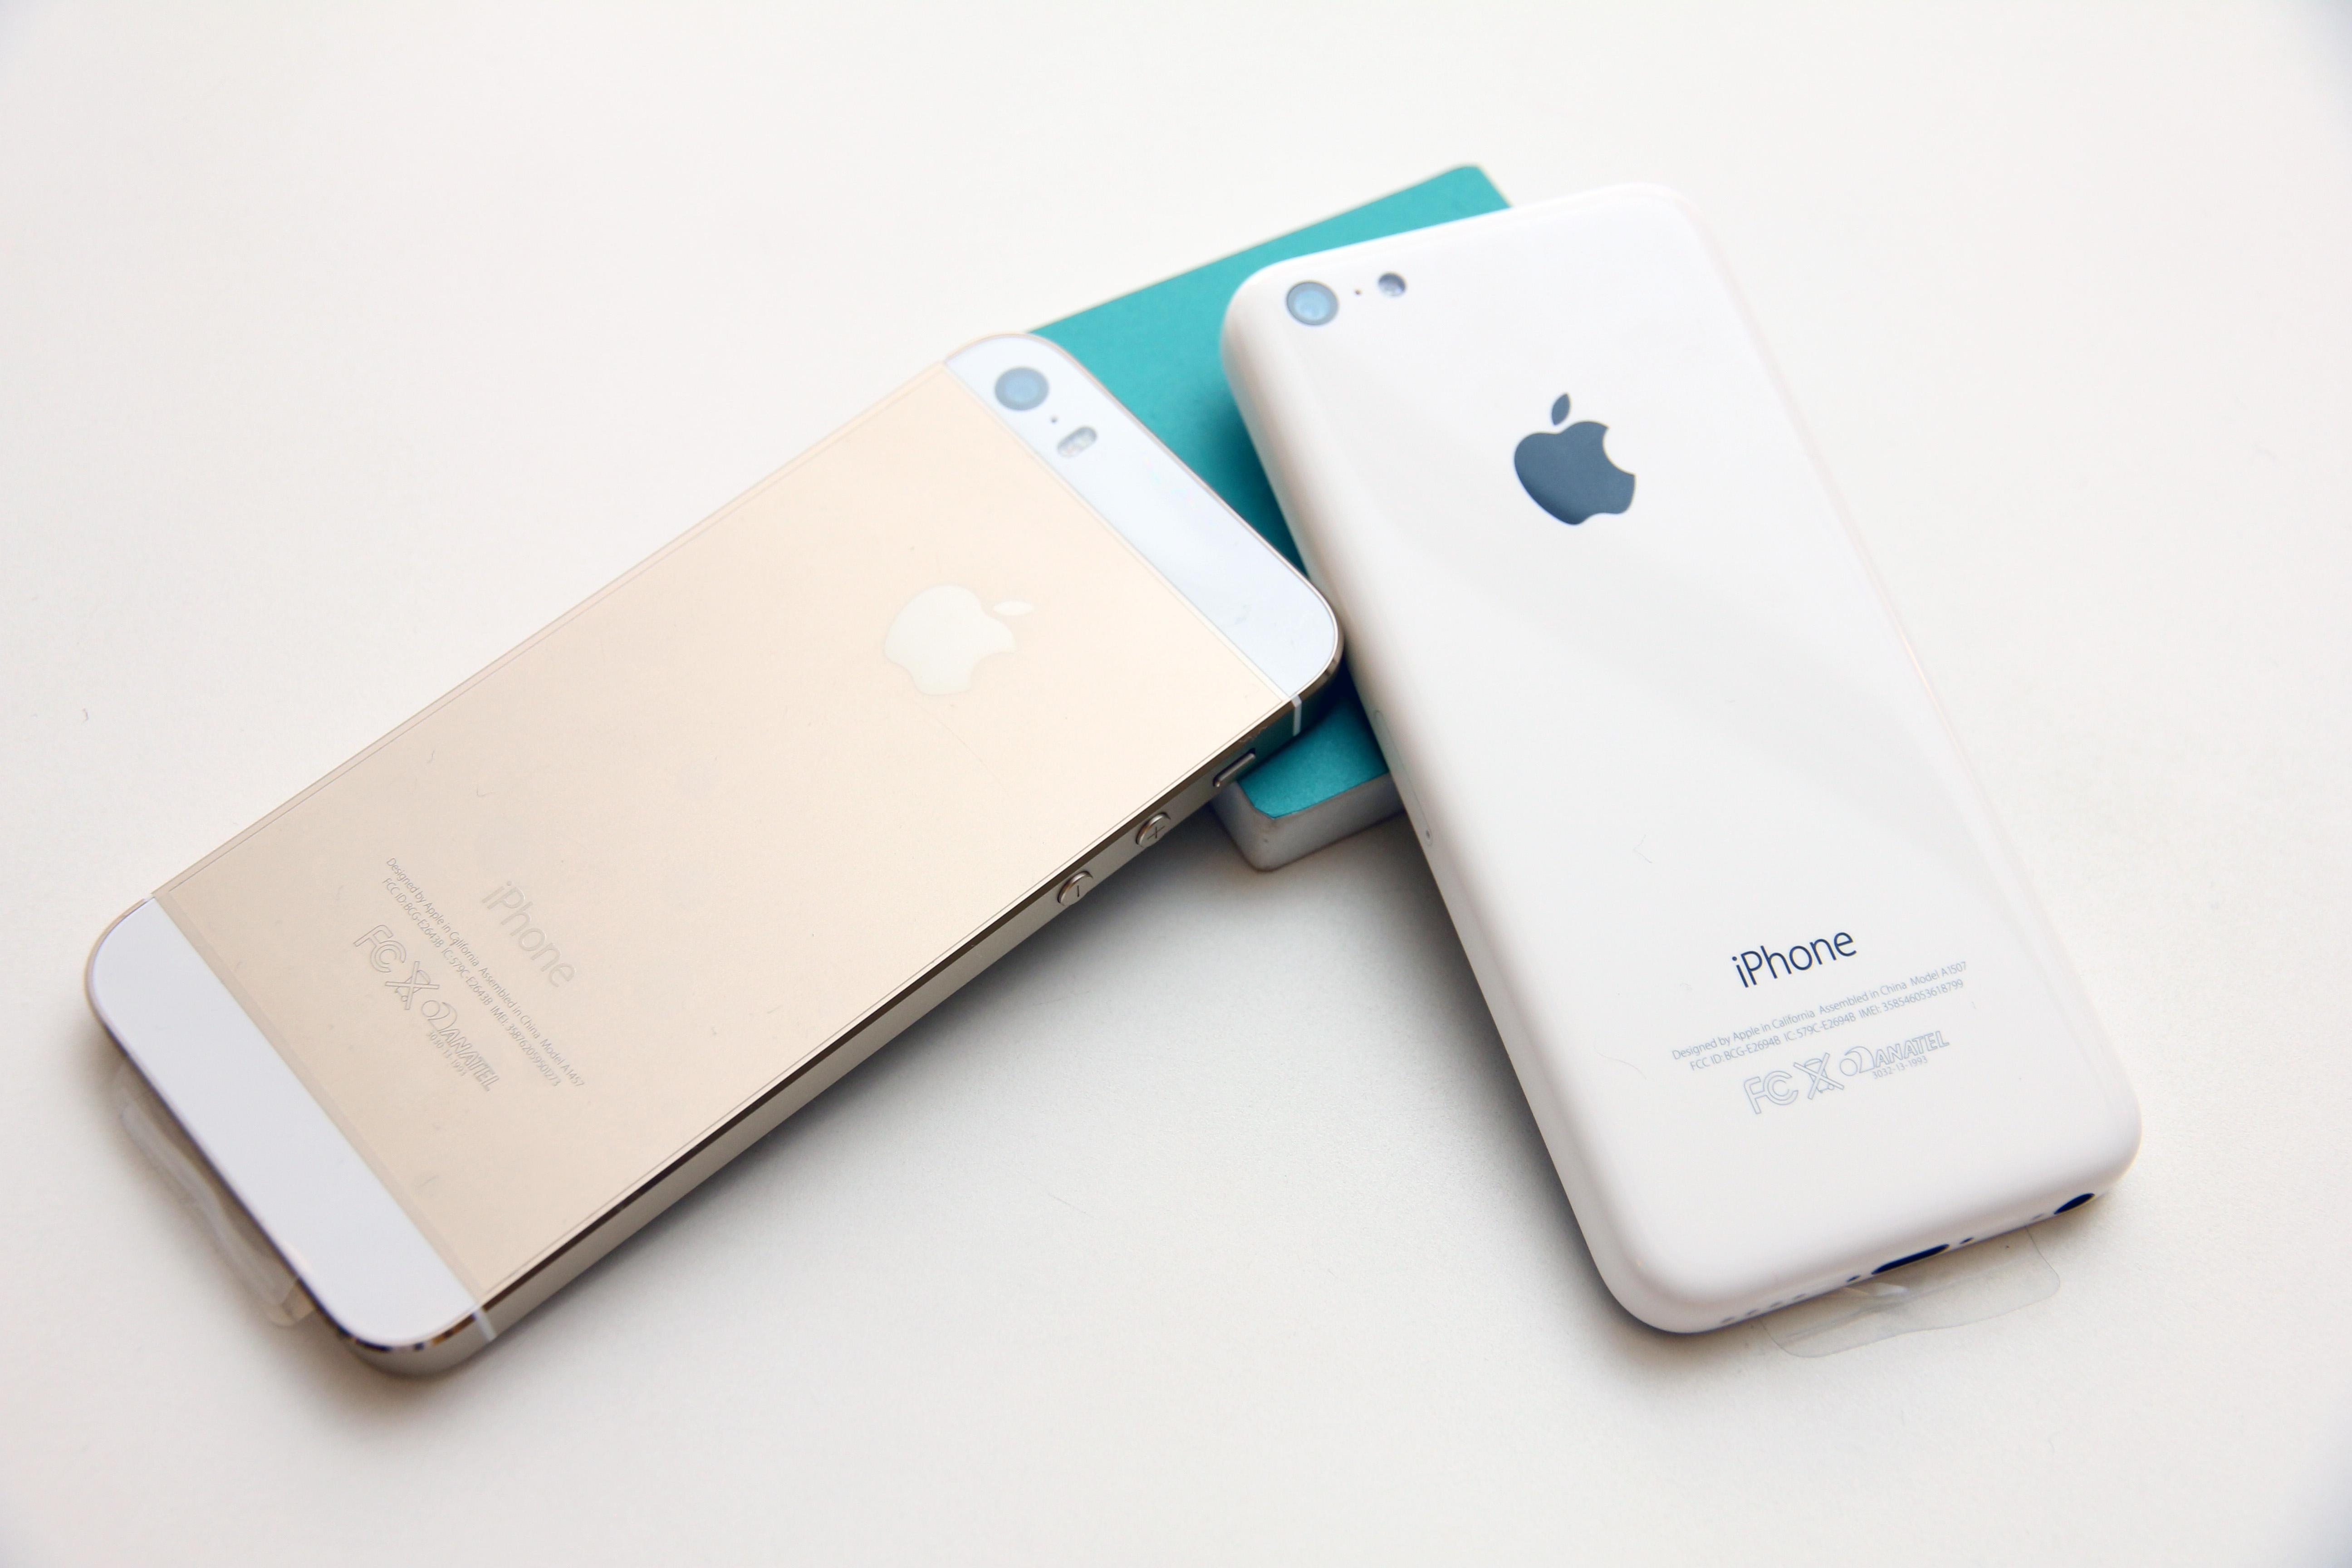 iPhone 5S e iPhone 5C (Foto: Allan Melo / TechTudo)